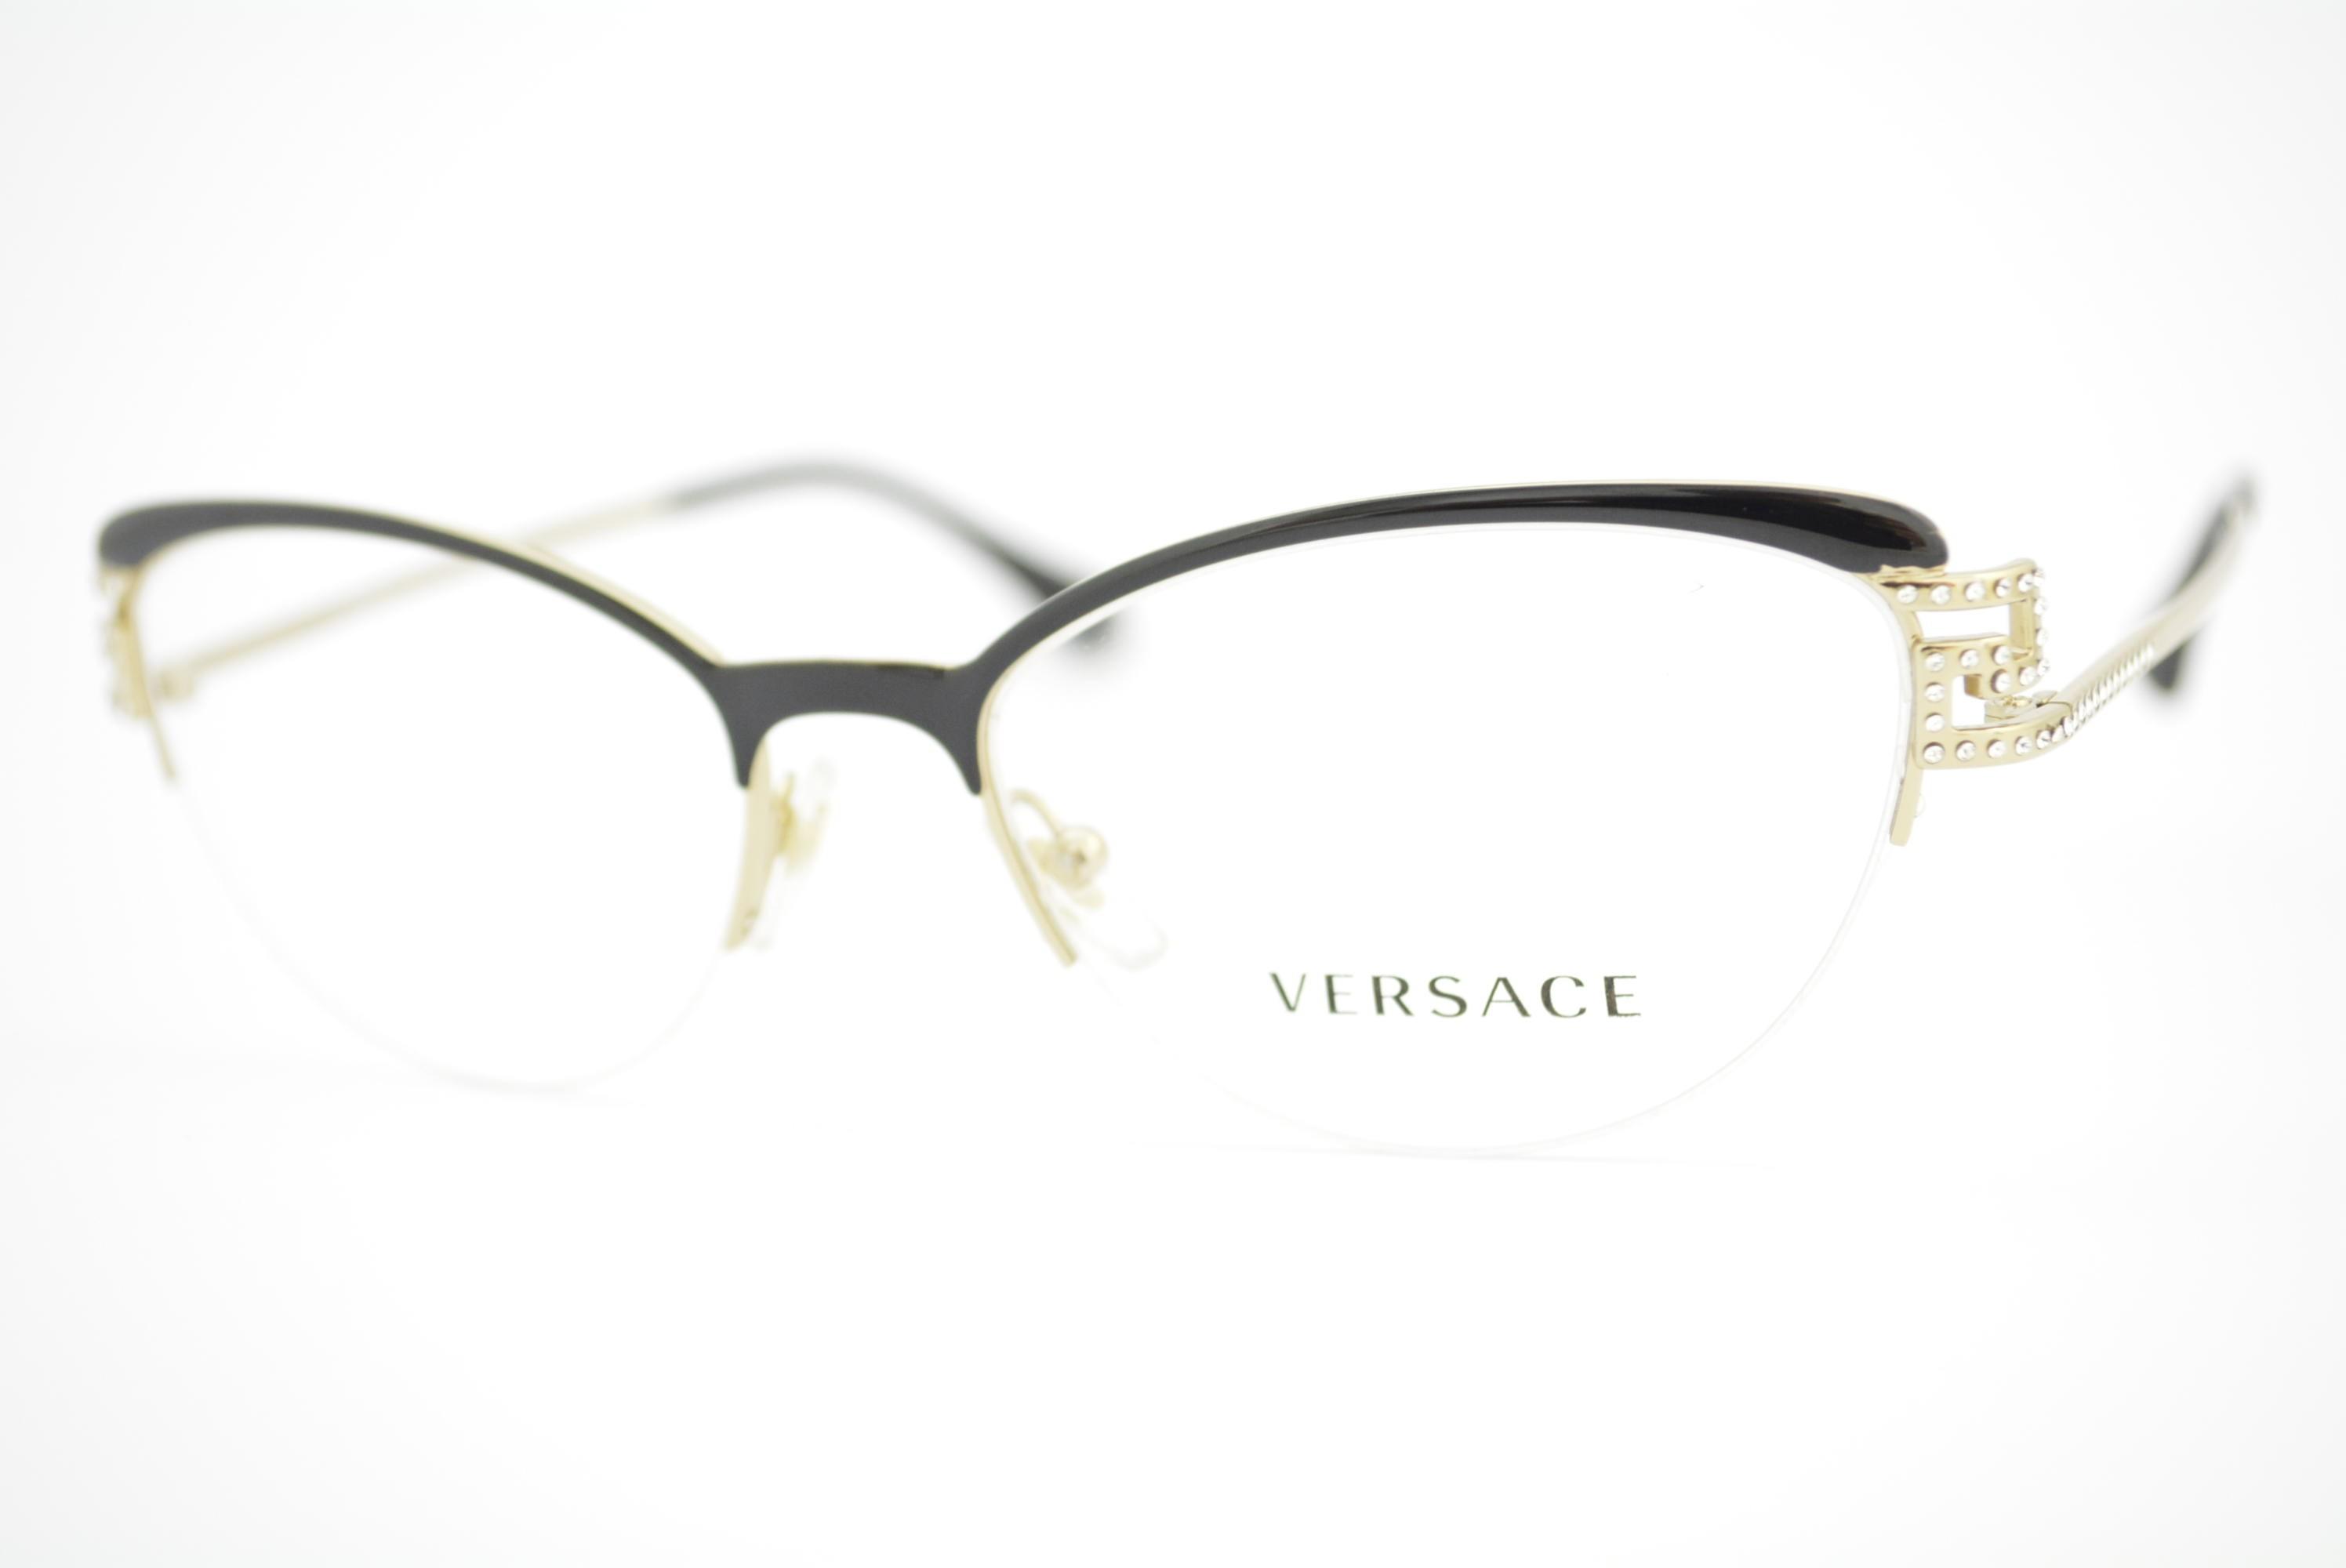 b74d15ddb armação de óculos Versace mod 1239-B 1291 Ótica Cardoso